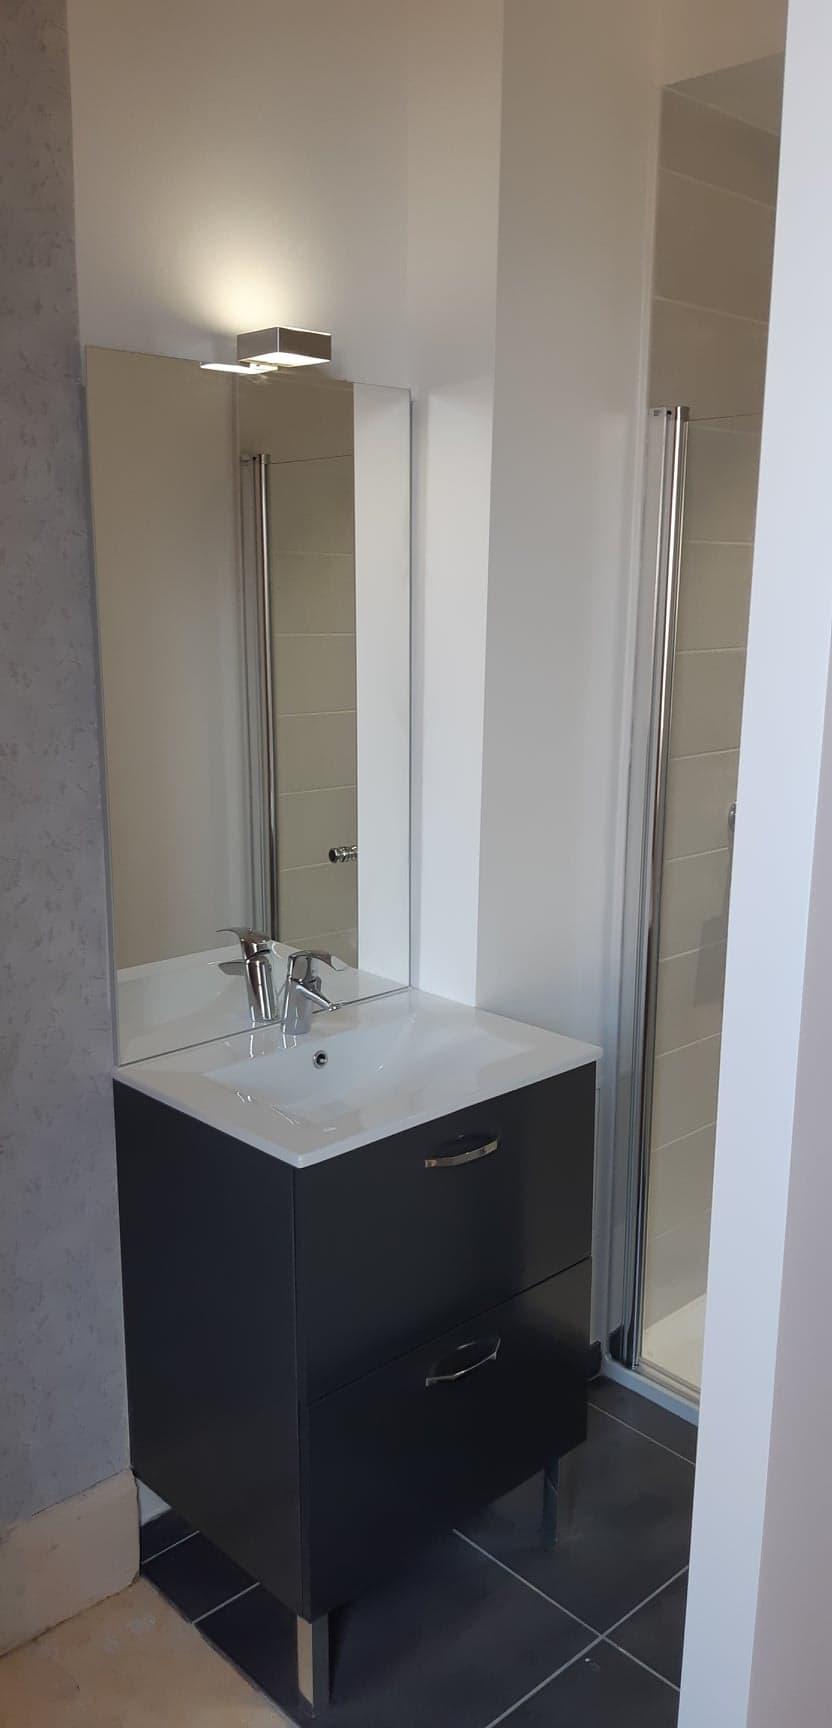 Installation meuble vasque + miroir Entreprise Pierrel 88100 Taintrux.